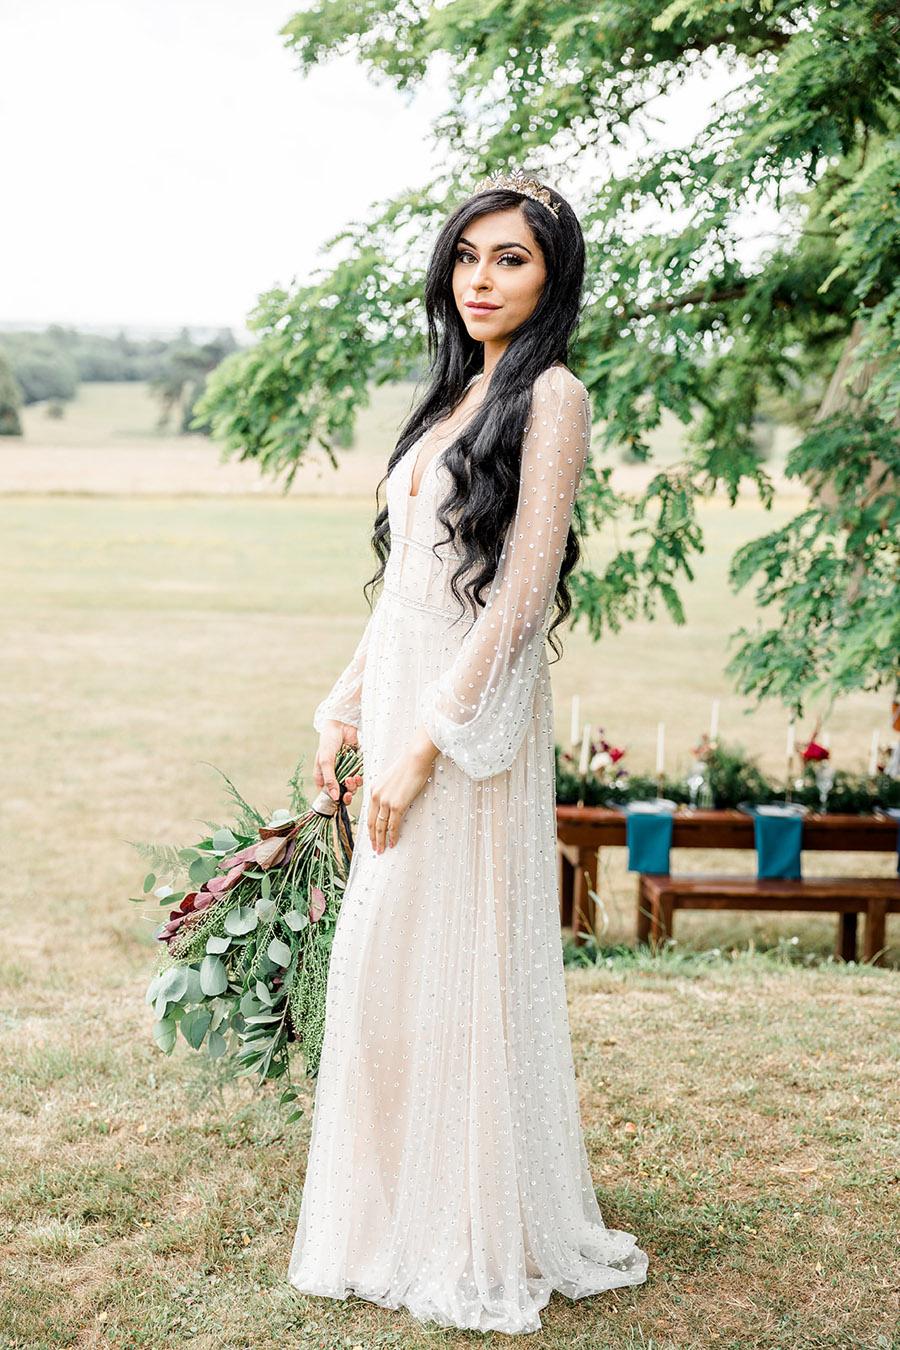 Modern Boho wedding style inspiration from Slindon House, photographer credit Kelsie Scully Photography (20)